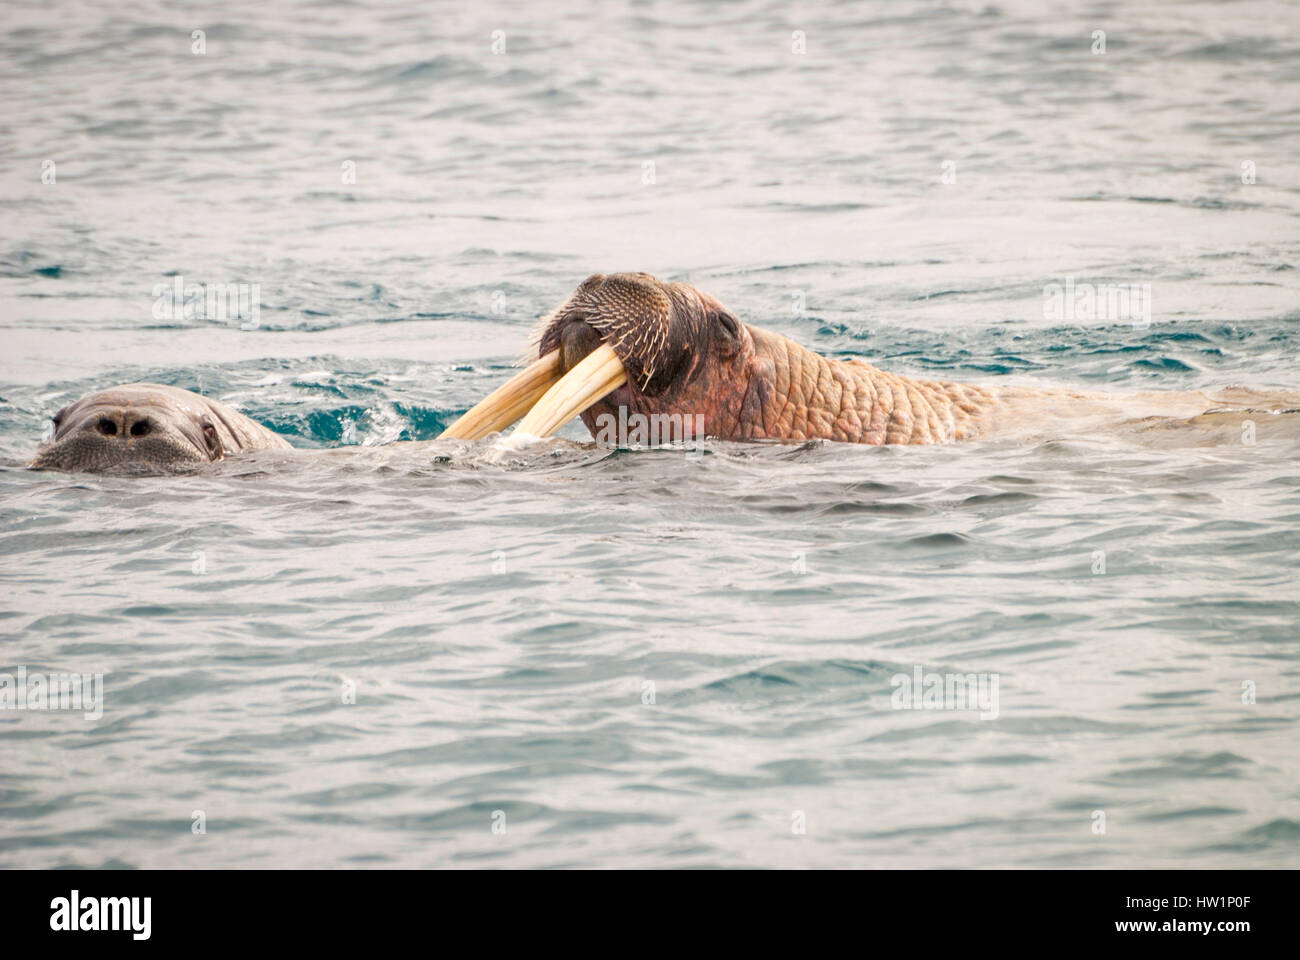 Walruses swimming in the sea Stock Photo